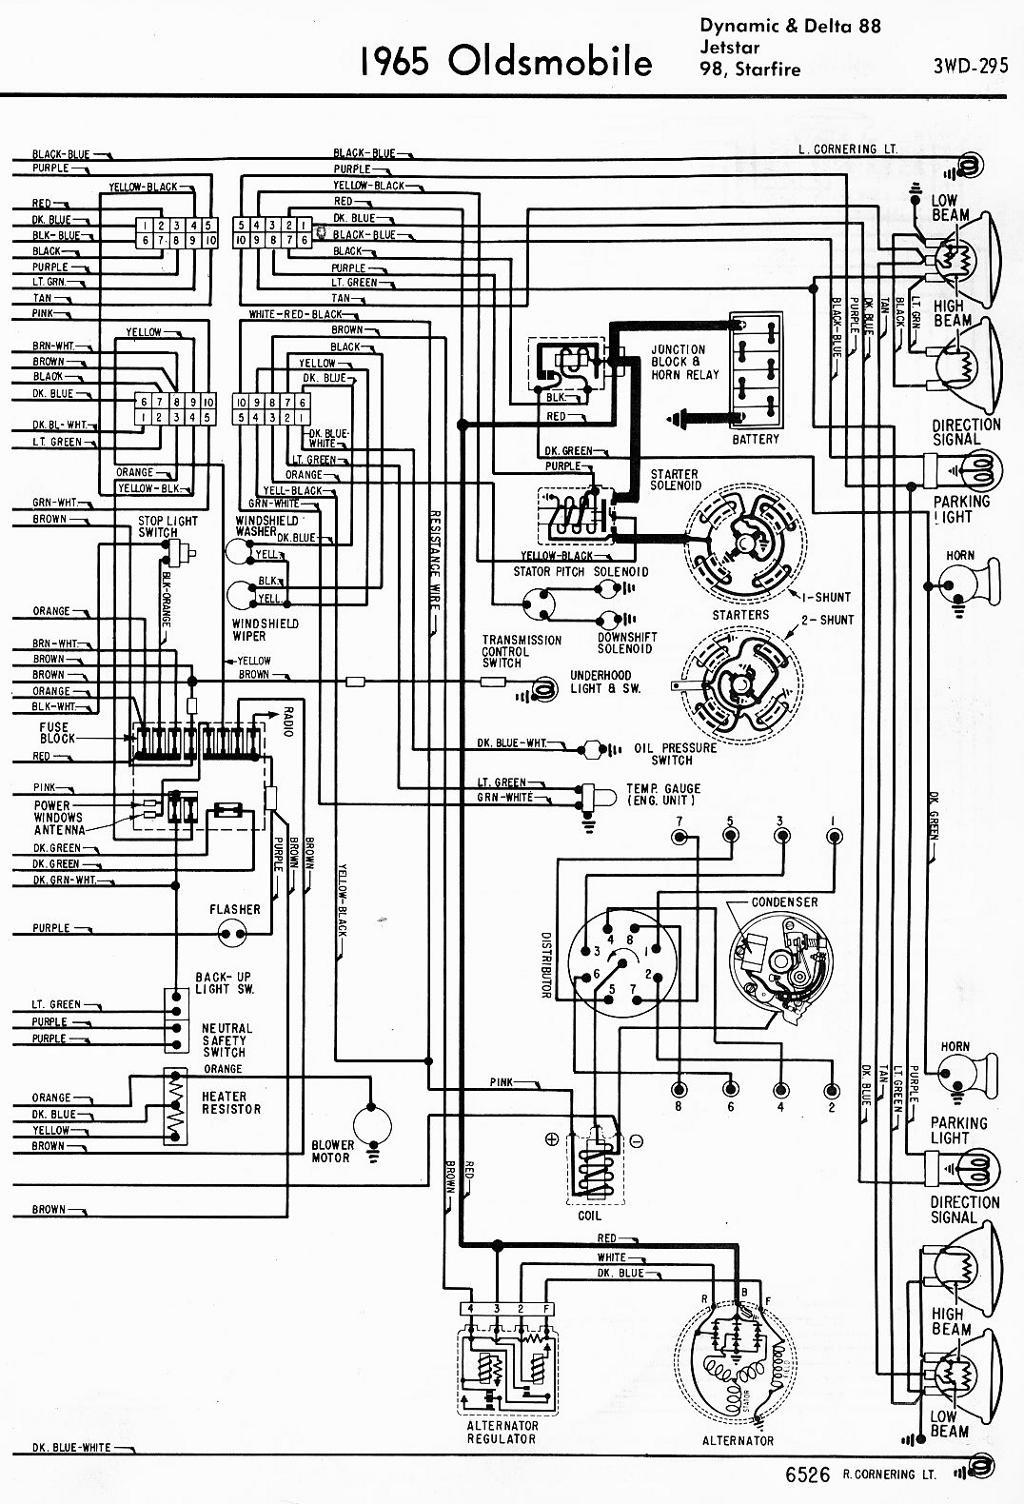 hight resolution of 2001 oldsmobile silhouette fuse diagram 2007 pontiac grand prix source 2001 oldsmobile silhouette wiring diagram